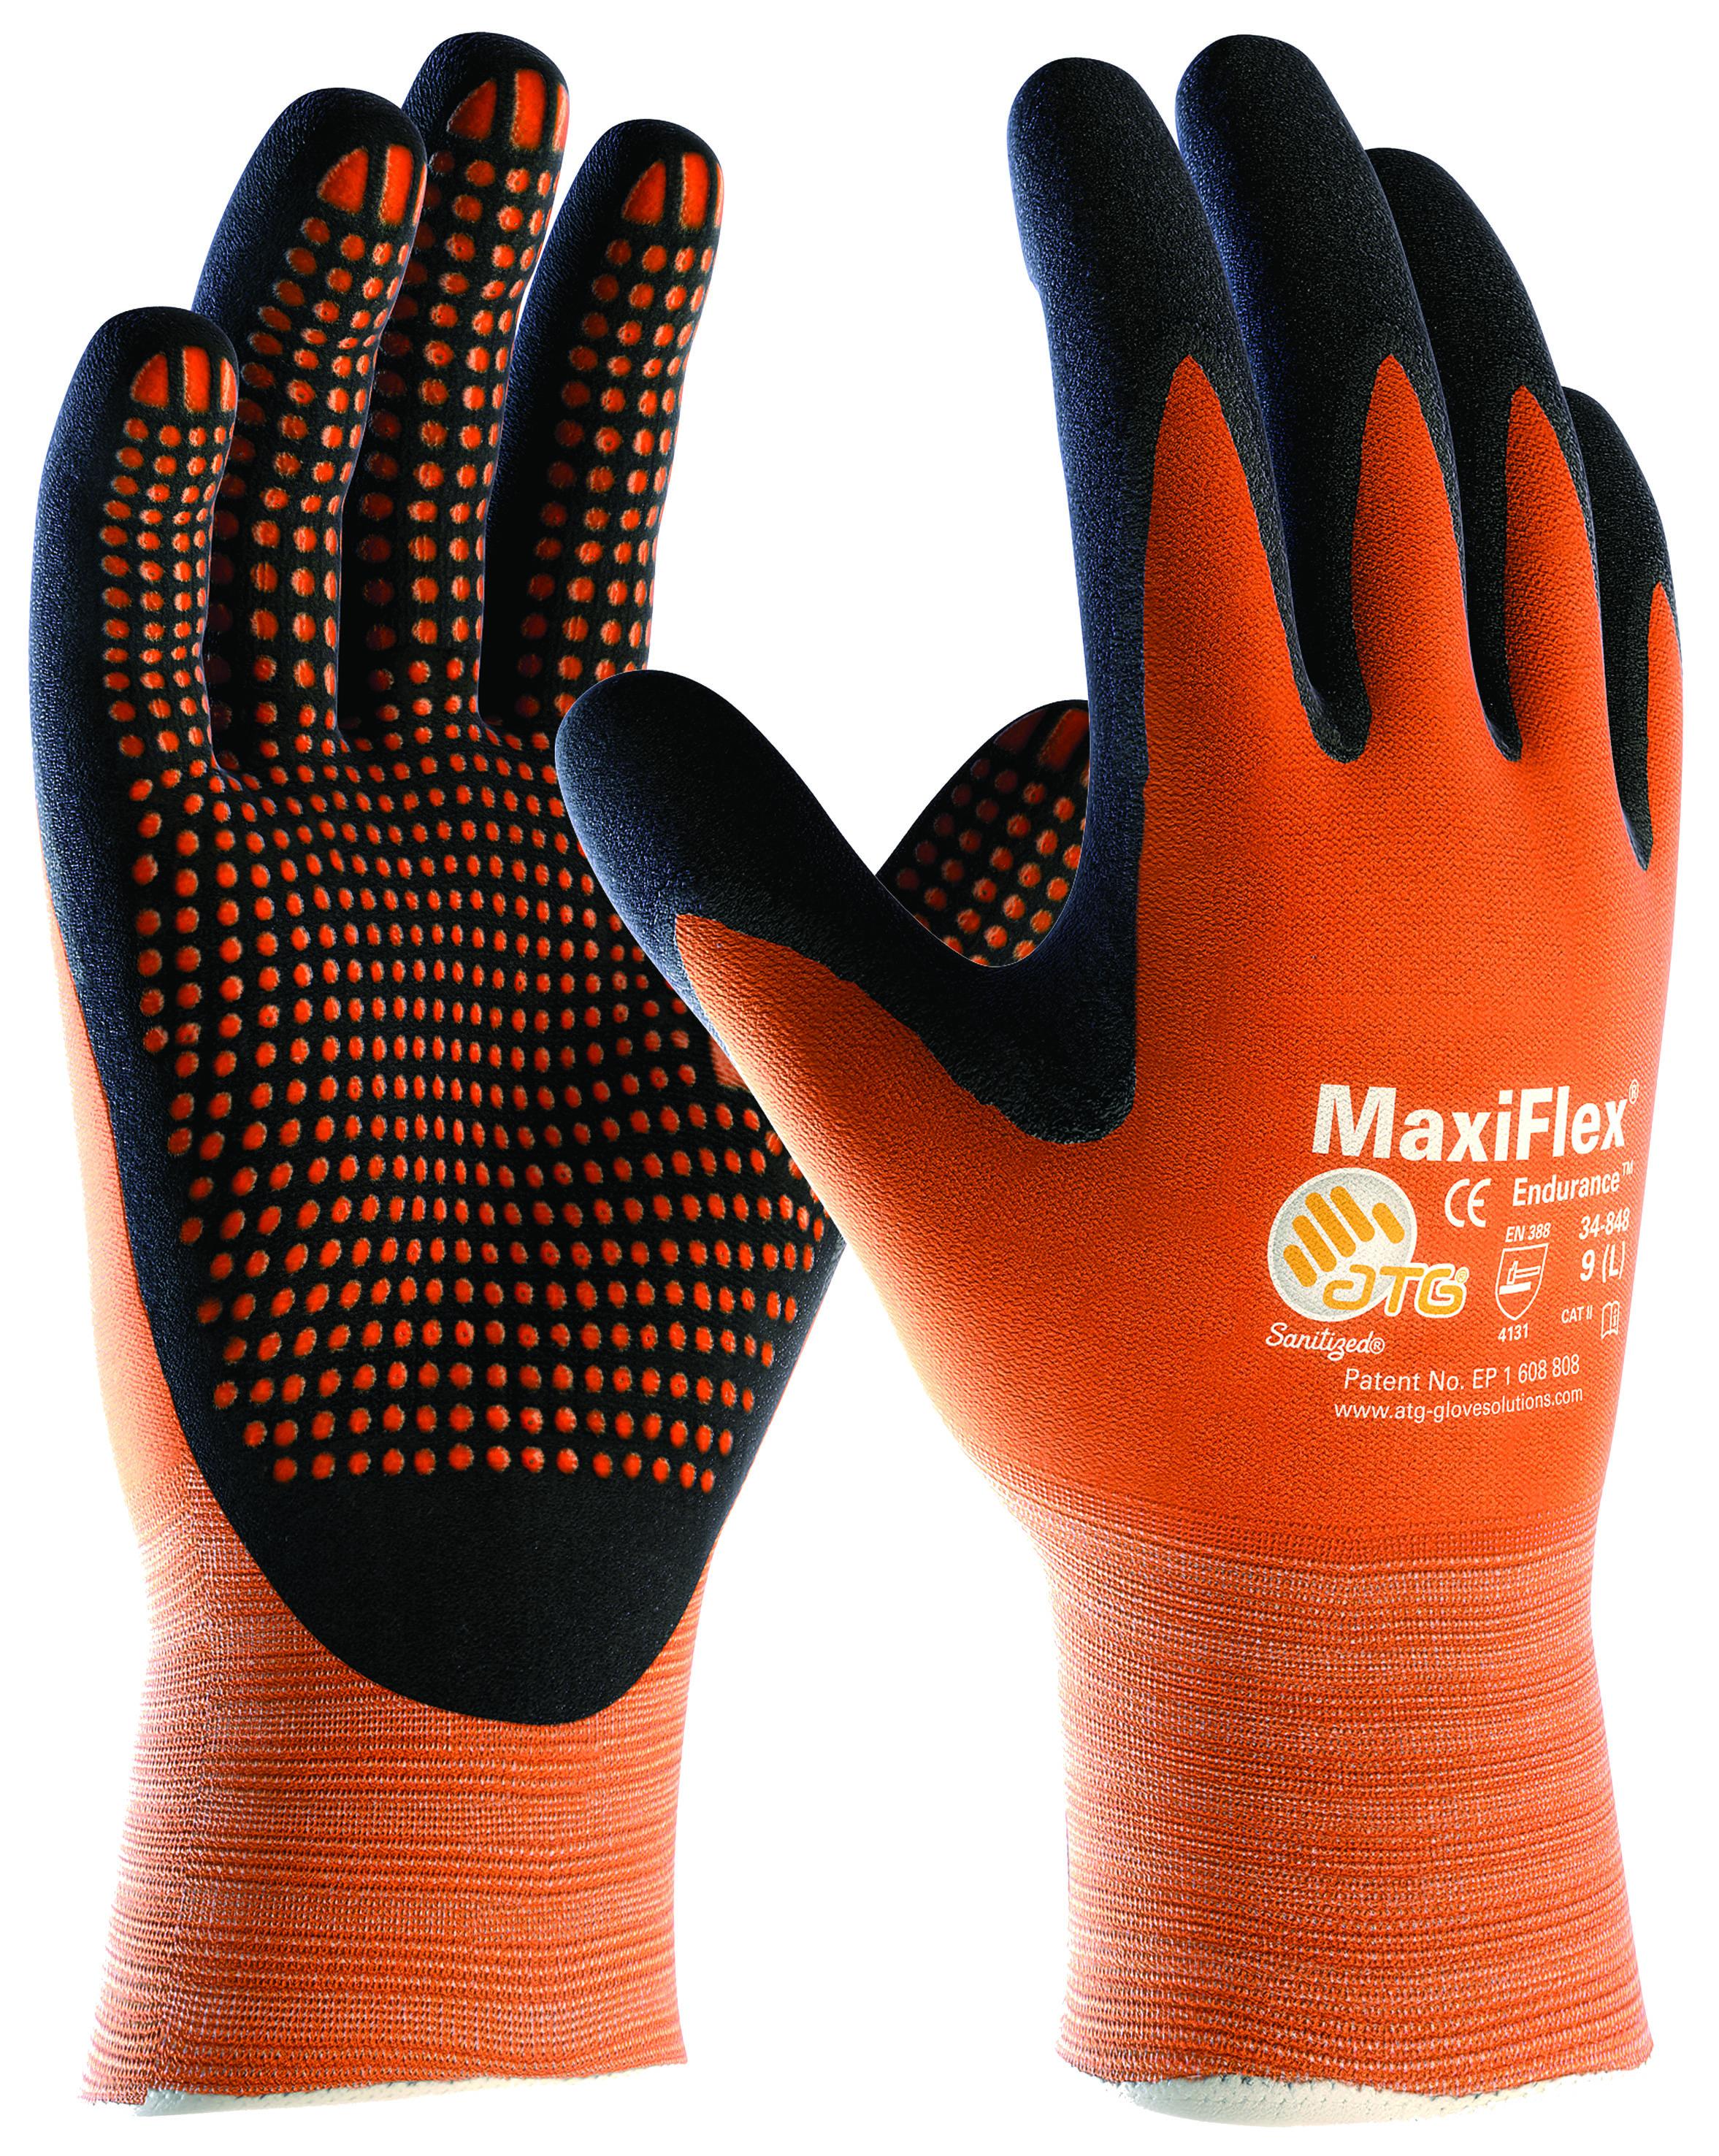 Rukavice MAXIFLEX ENDURANCE 42-848 11